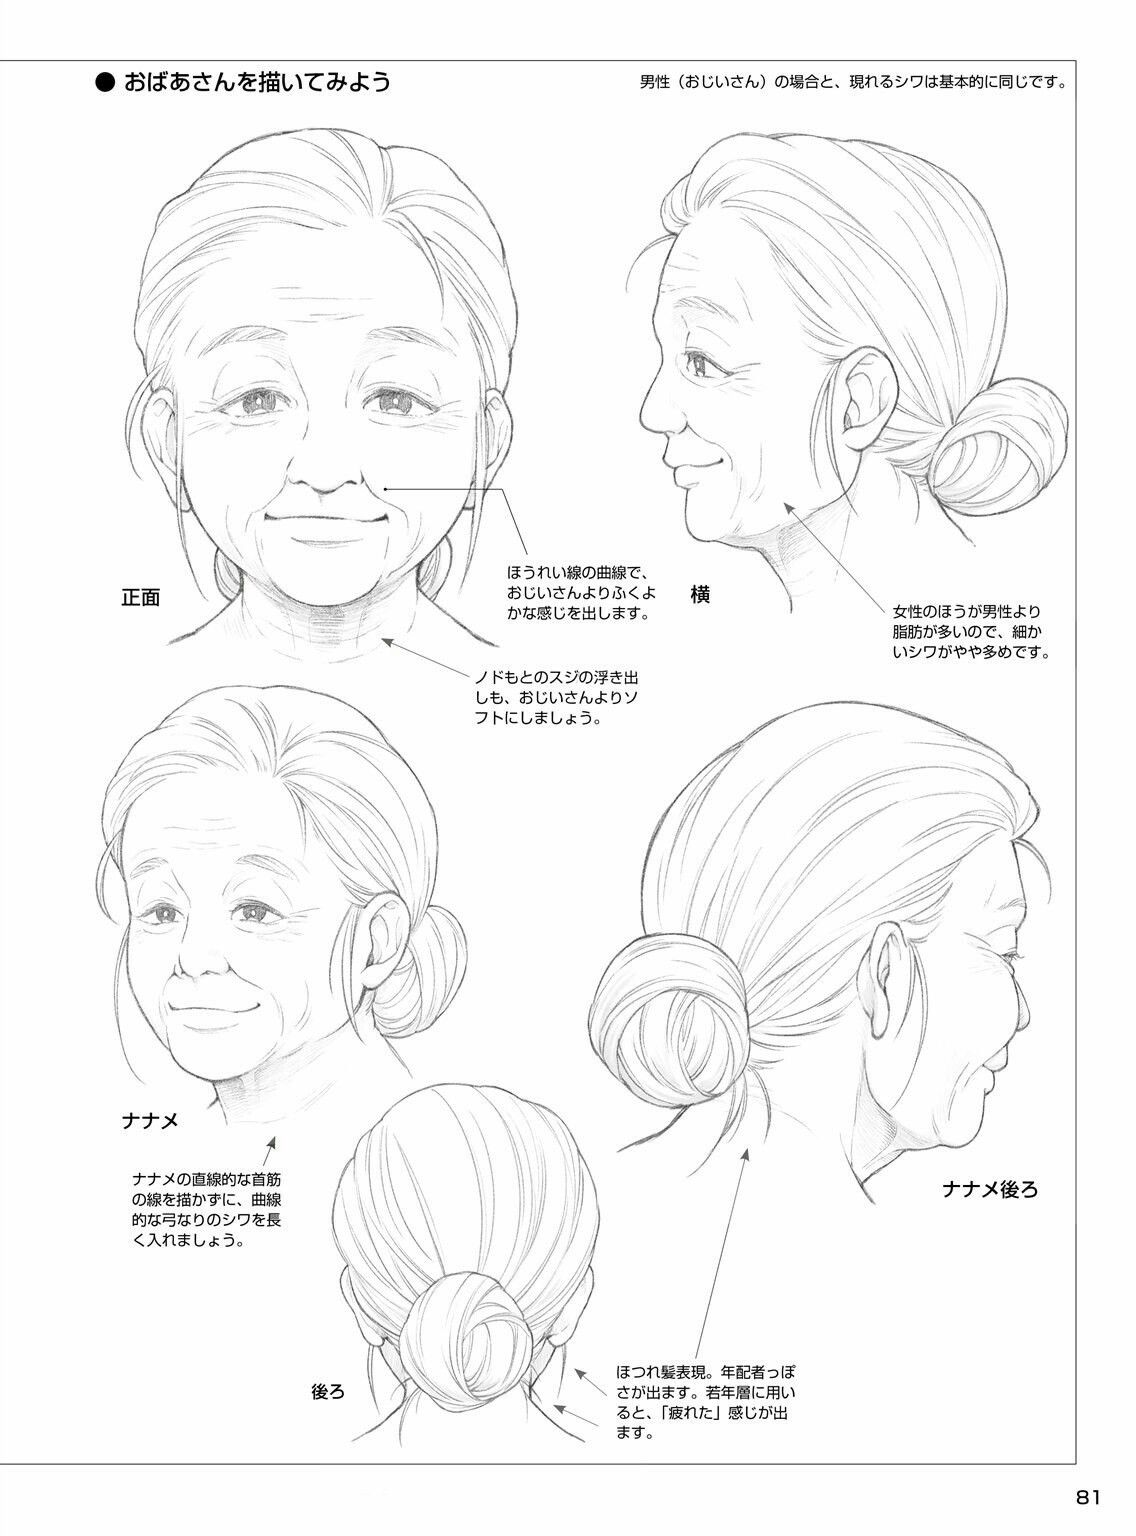 1136x1536 Pin By Ks Pang On Manga, Draw And Body